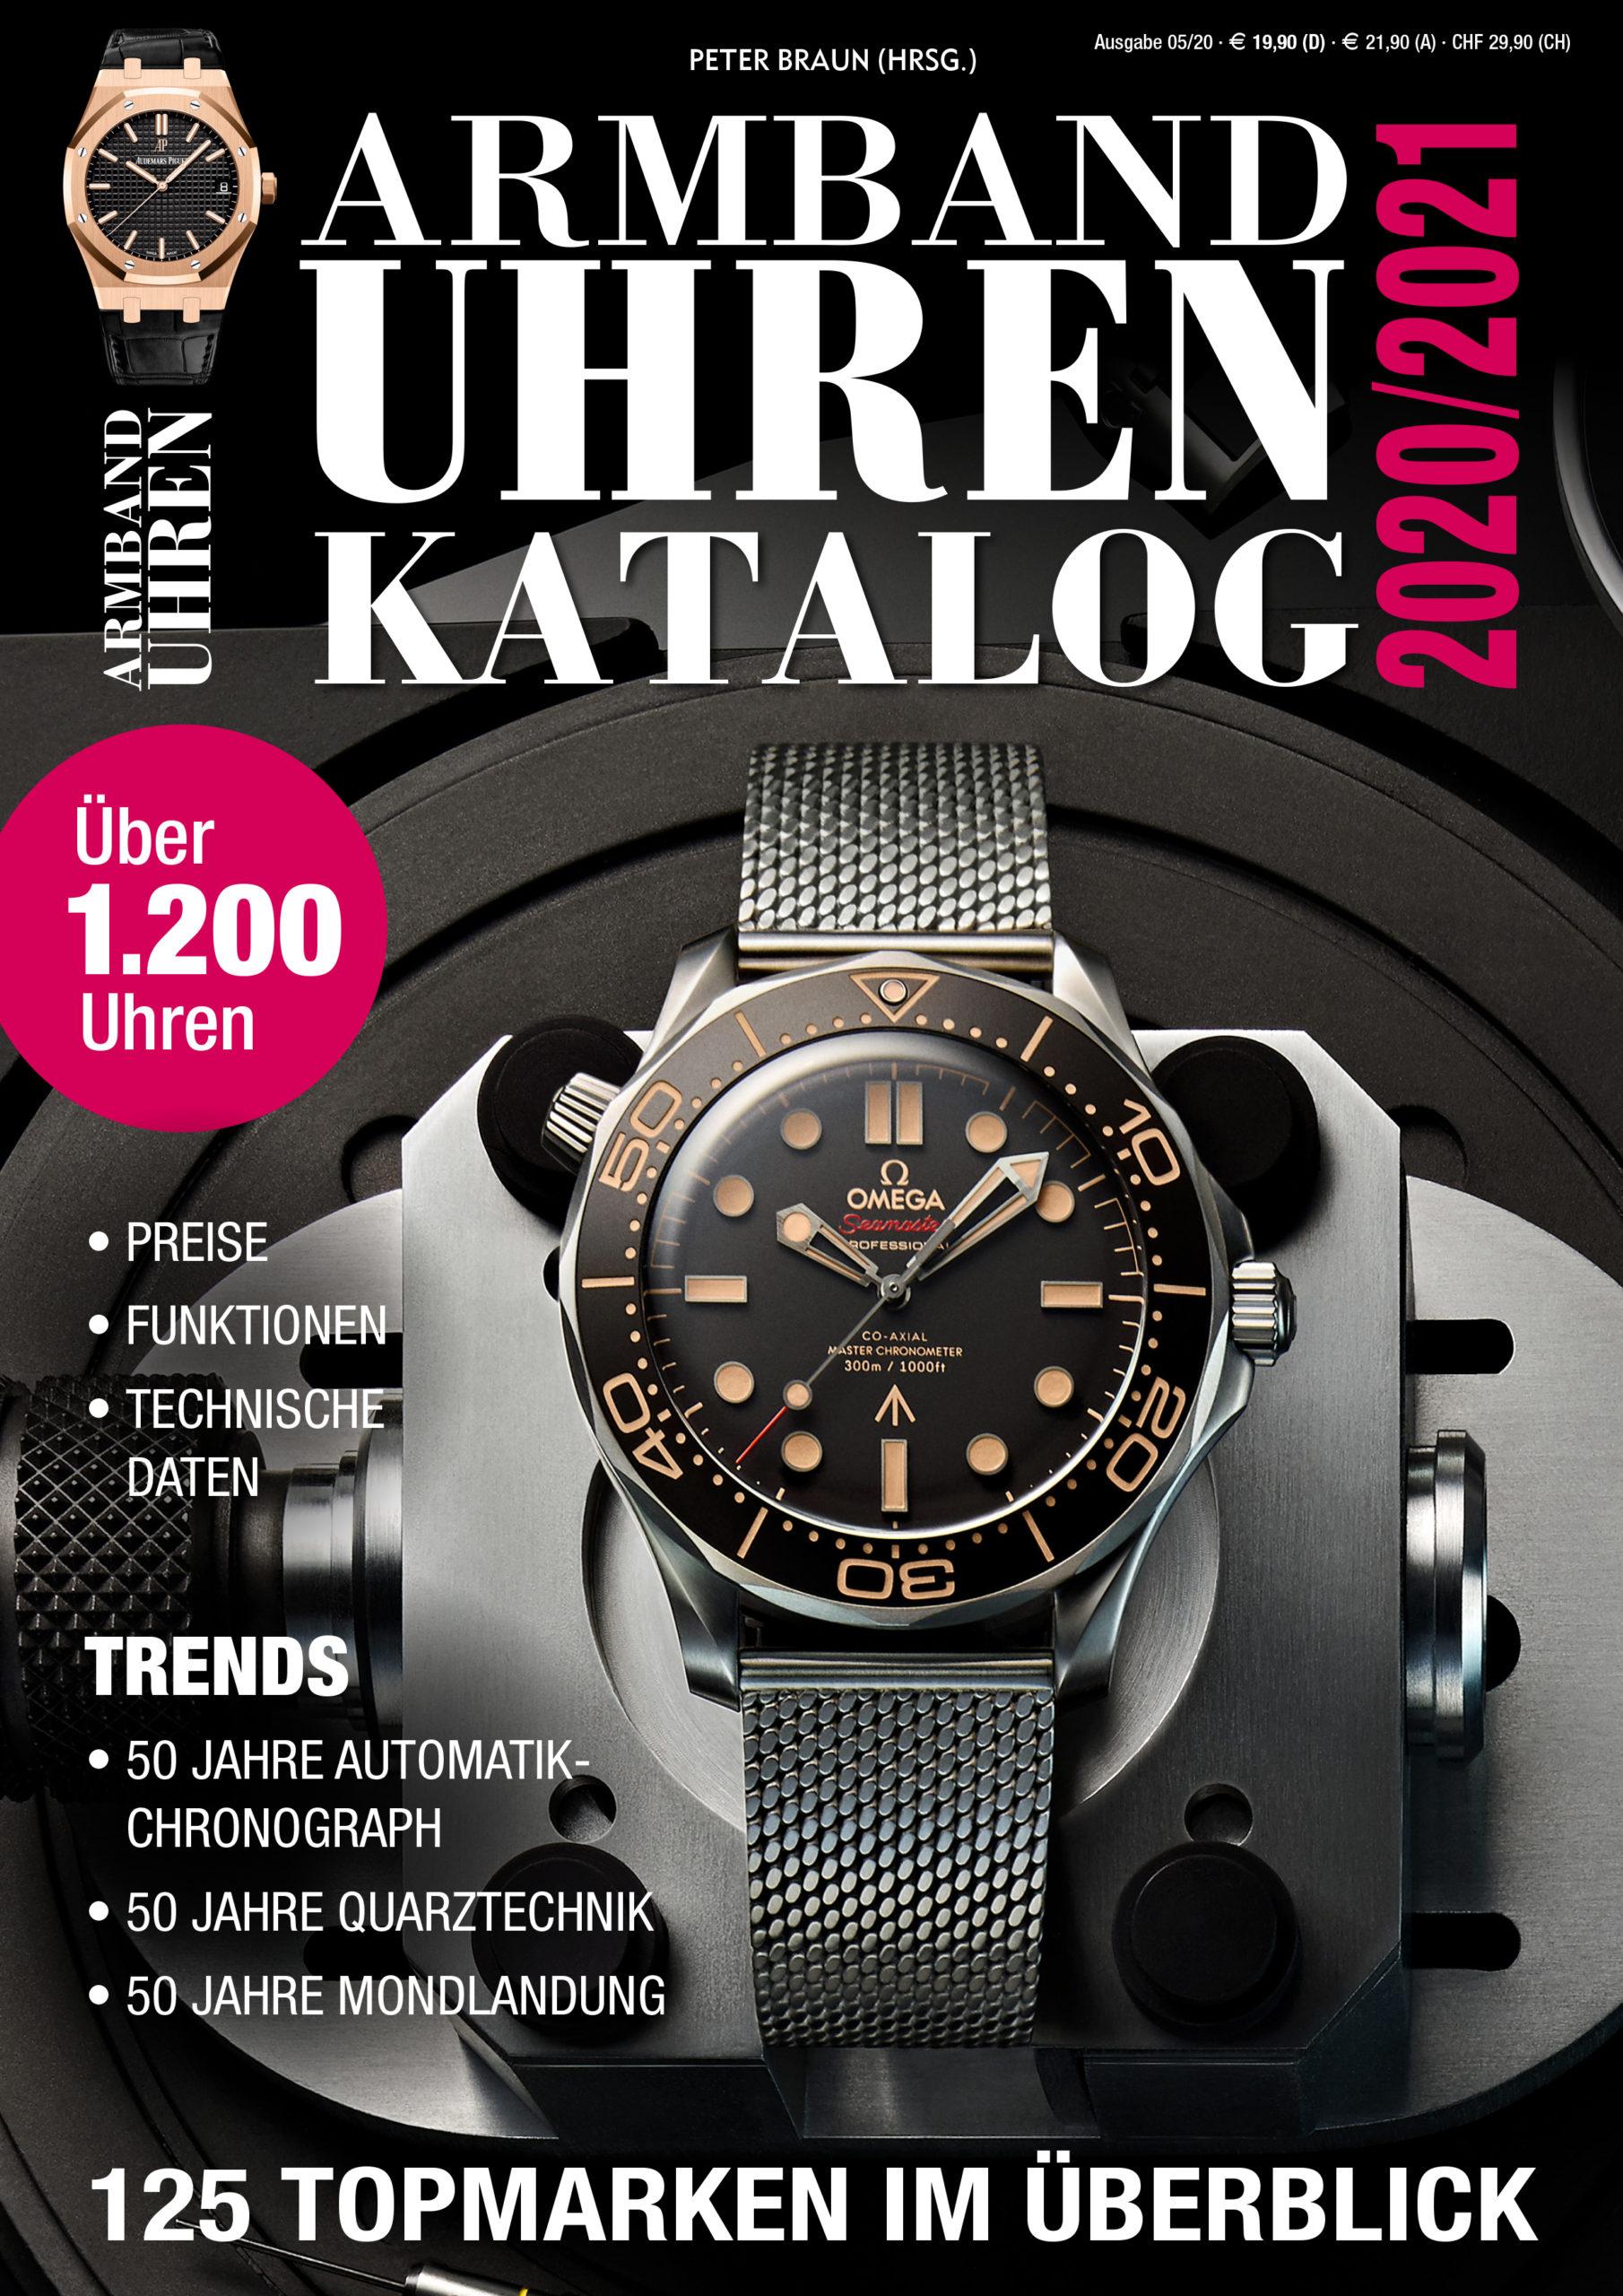 Armbanduhren-Katalog 2020/2021